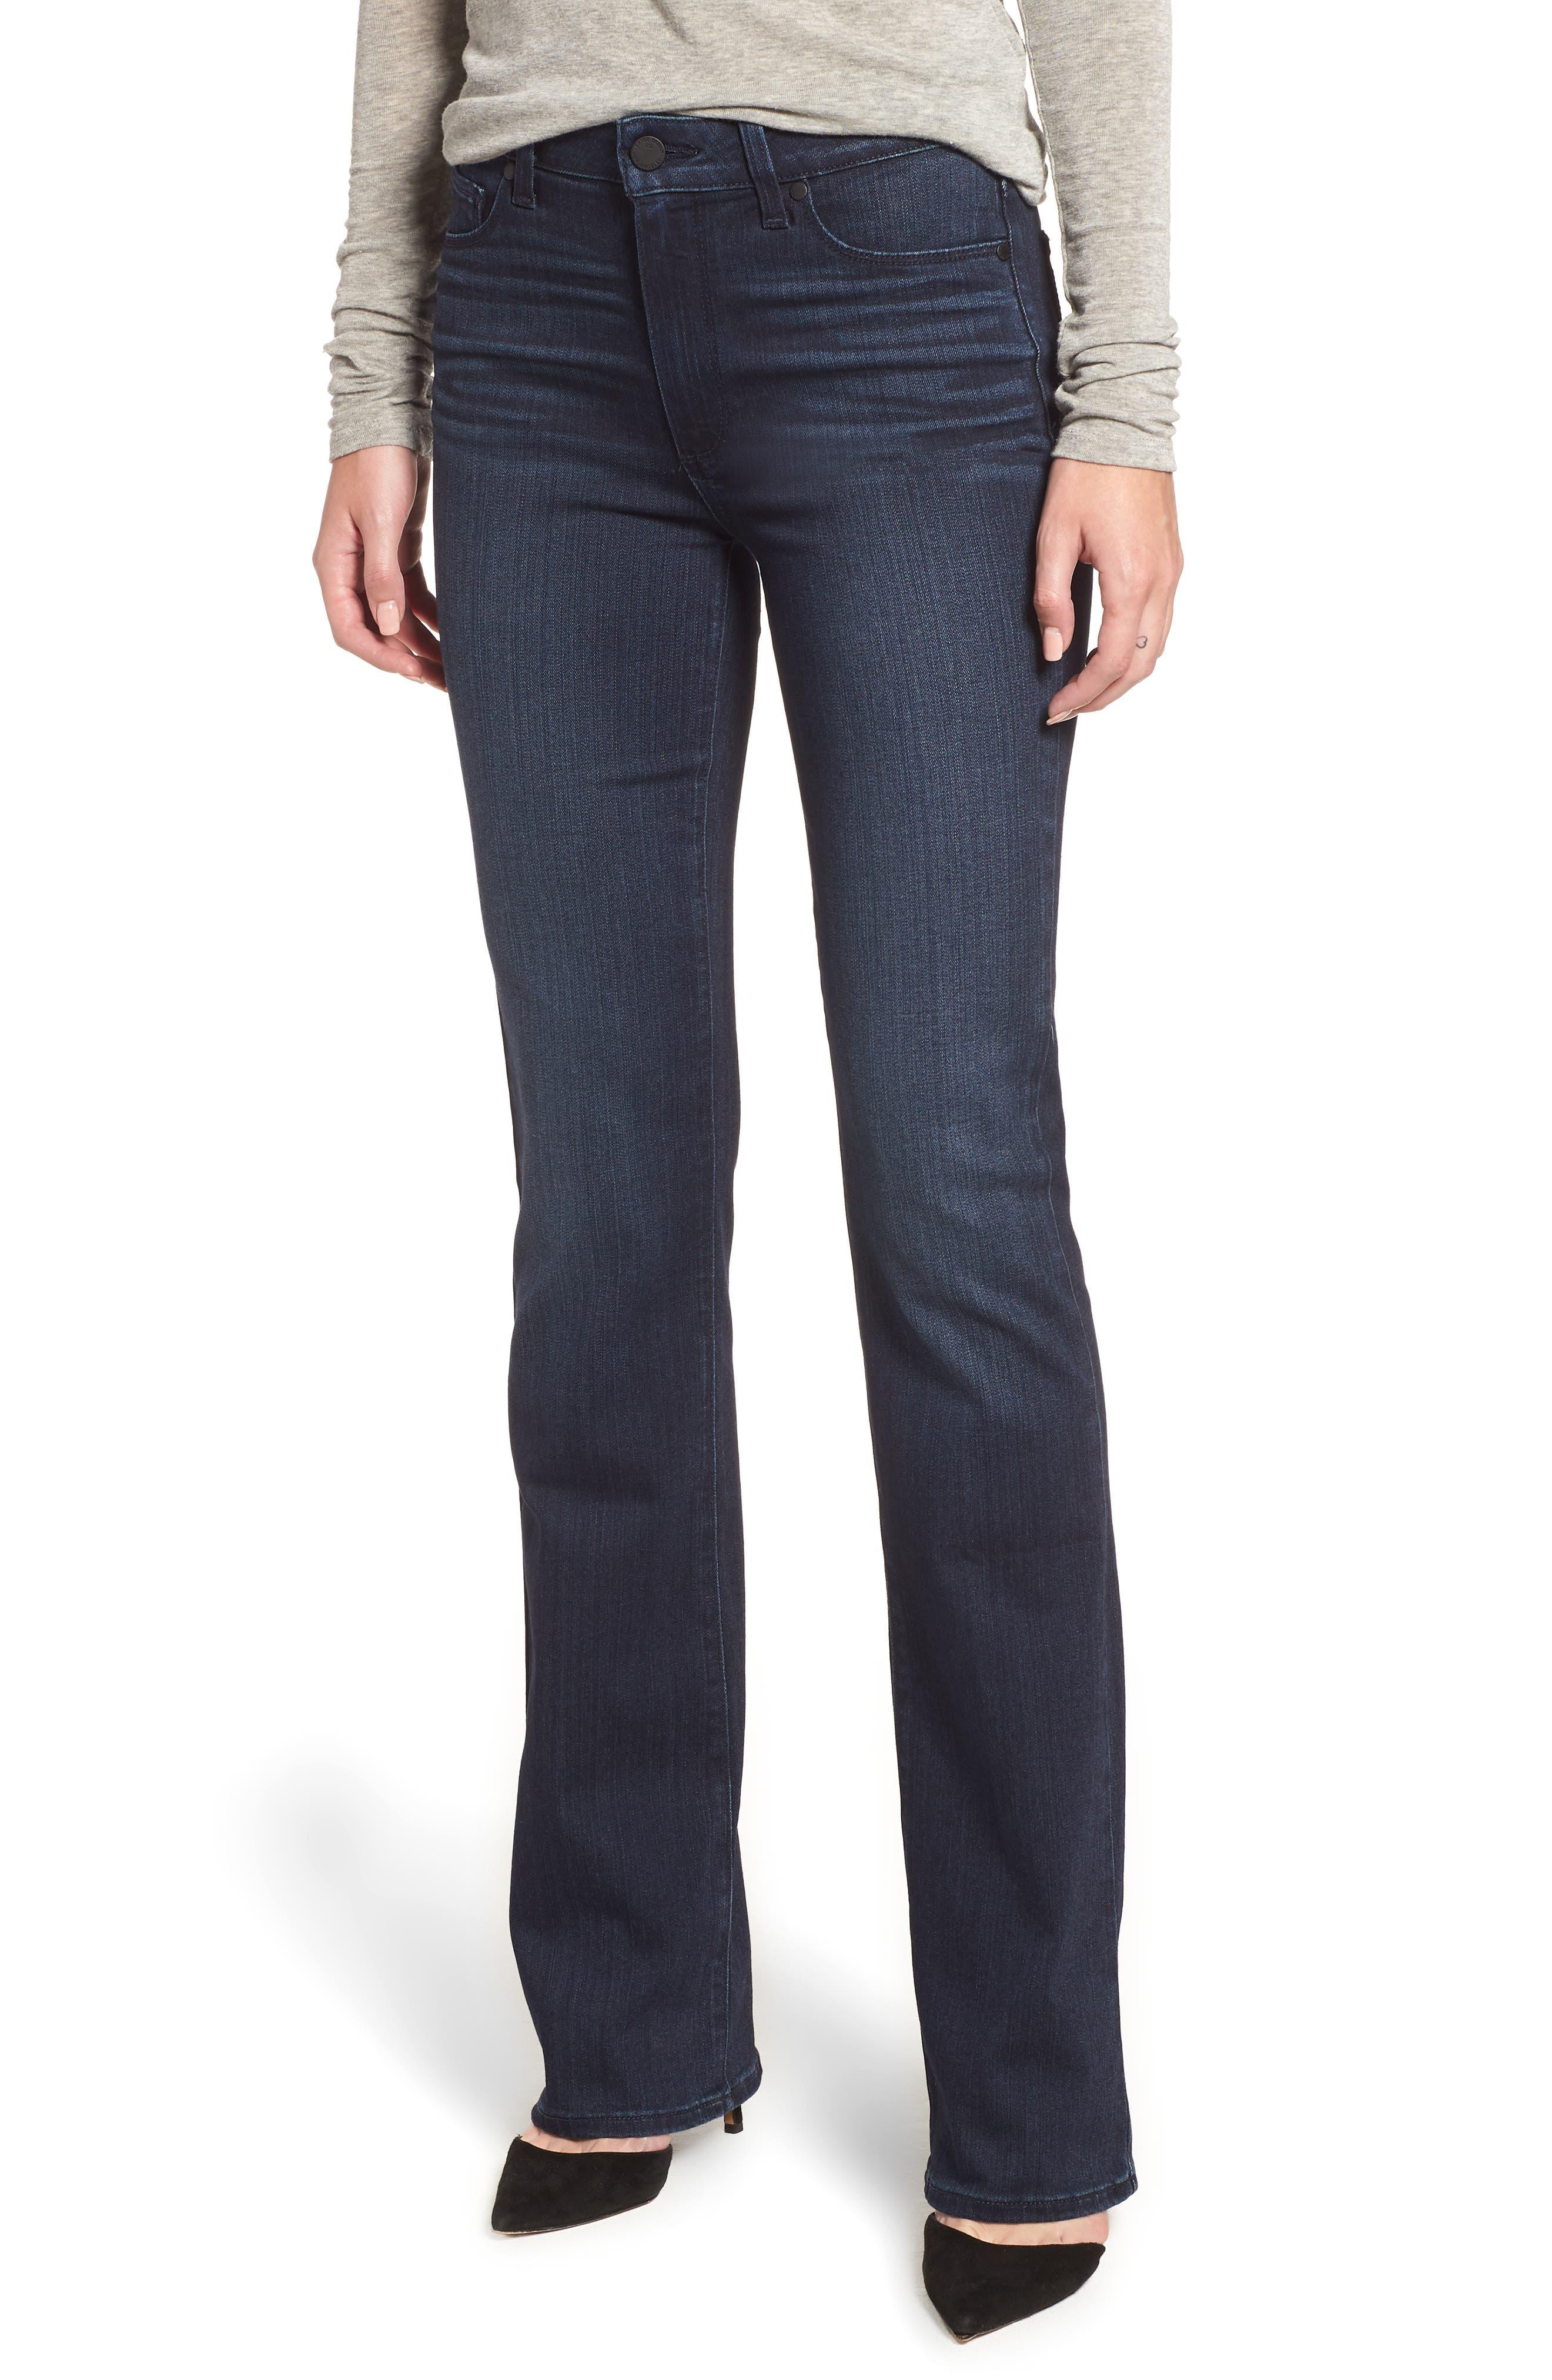 PAIGE, Manhattan High Waist Bootcut Jeans, Main thumbnail 1, color, ROSEVILLE